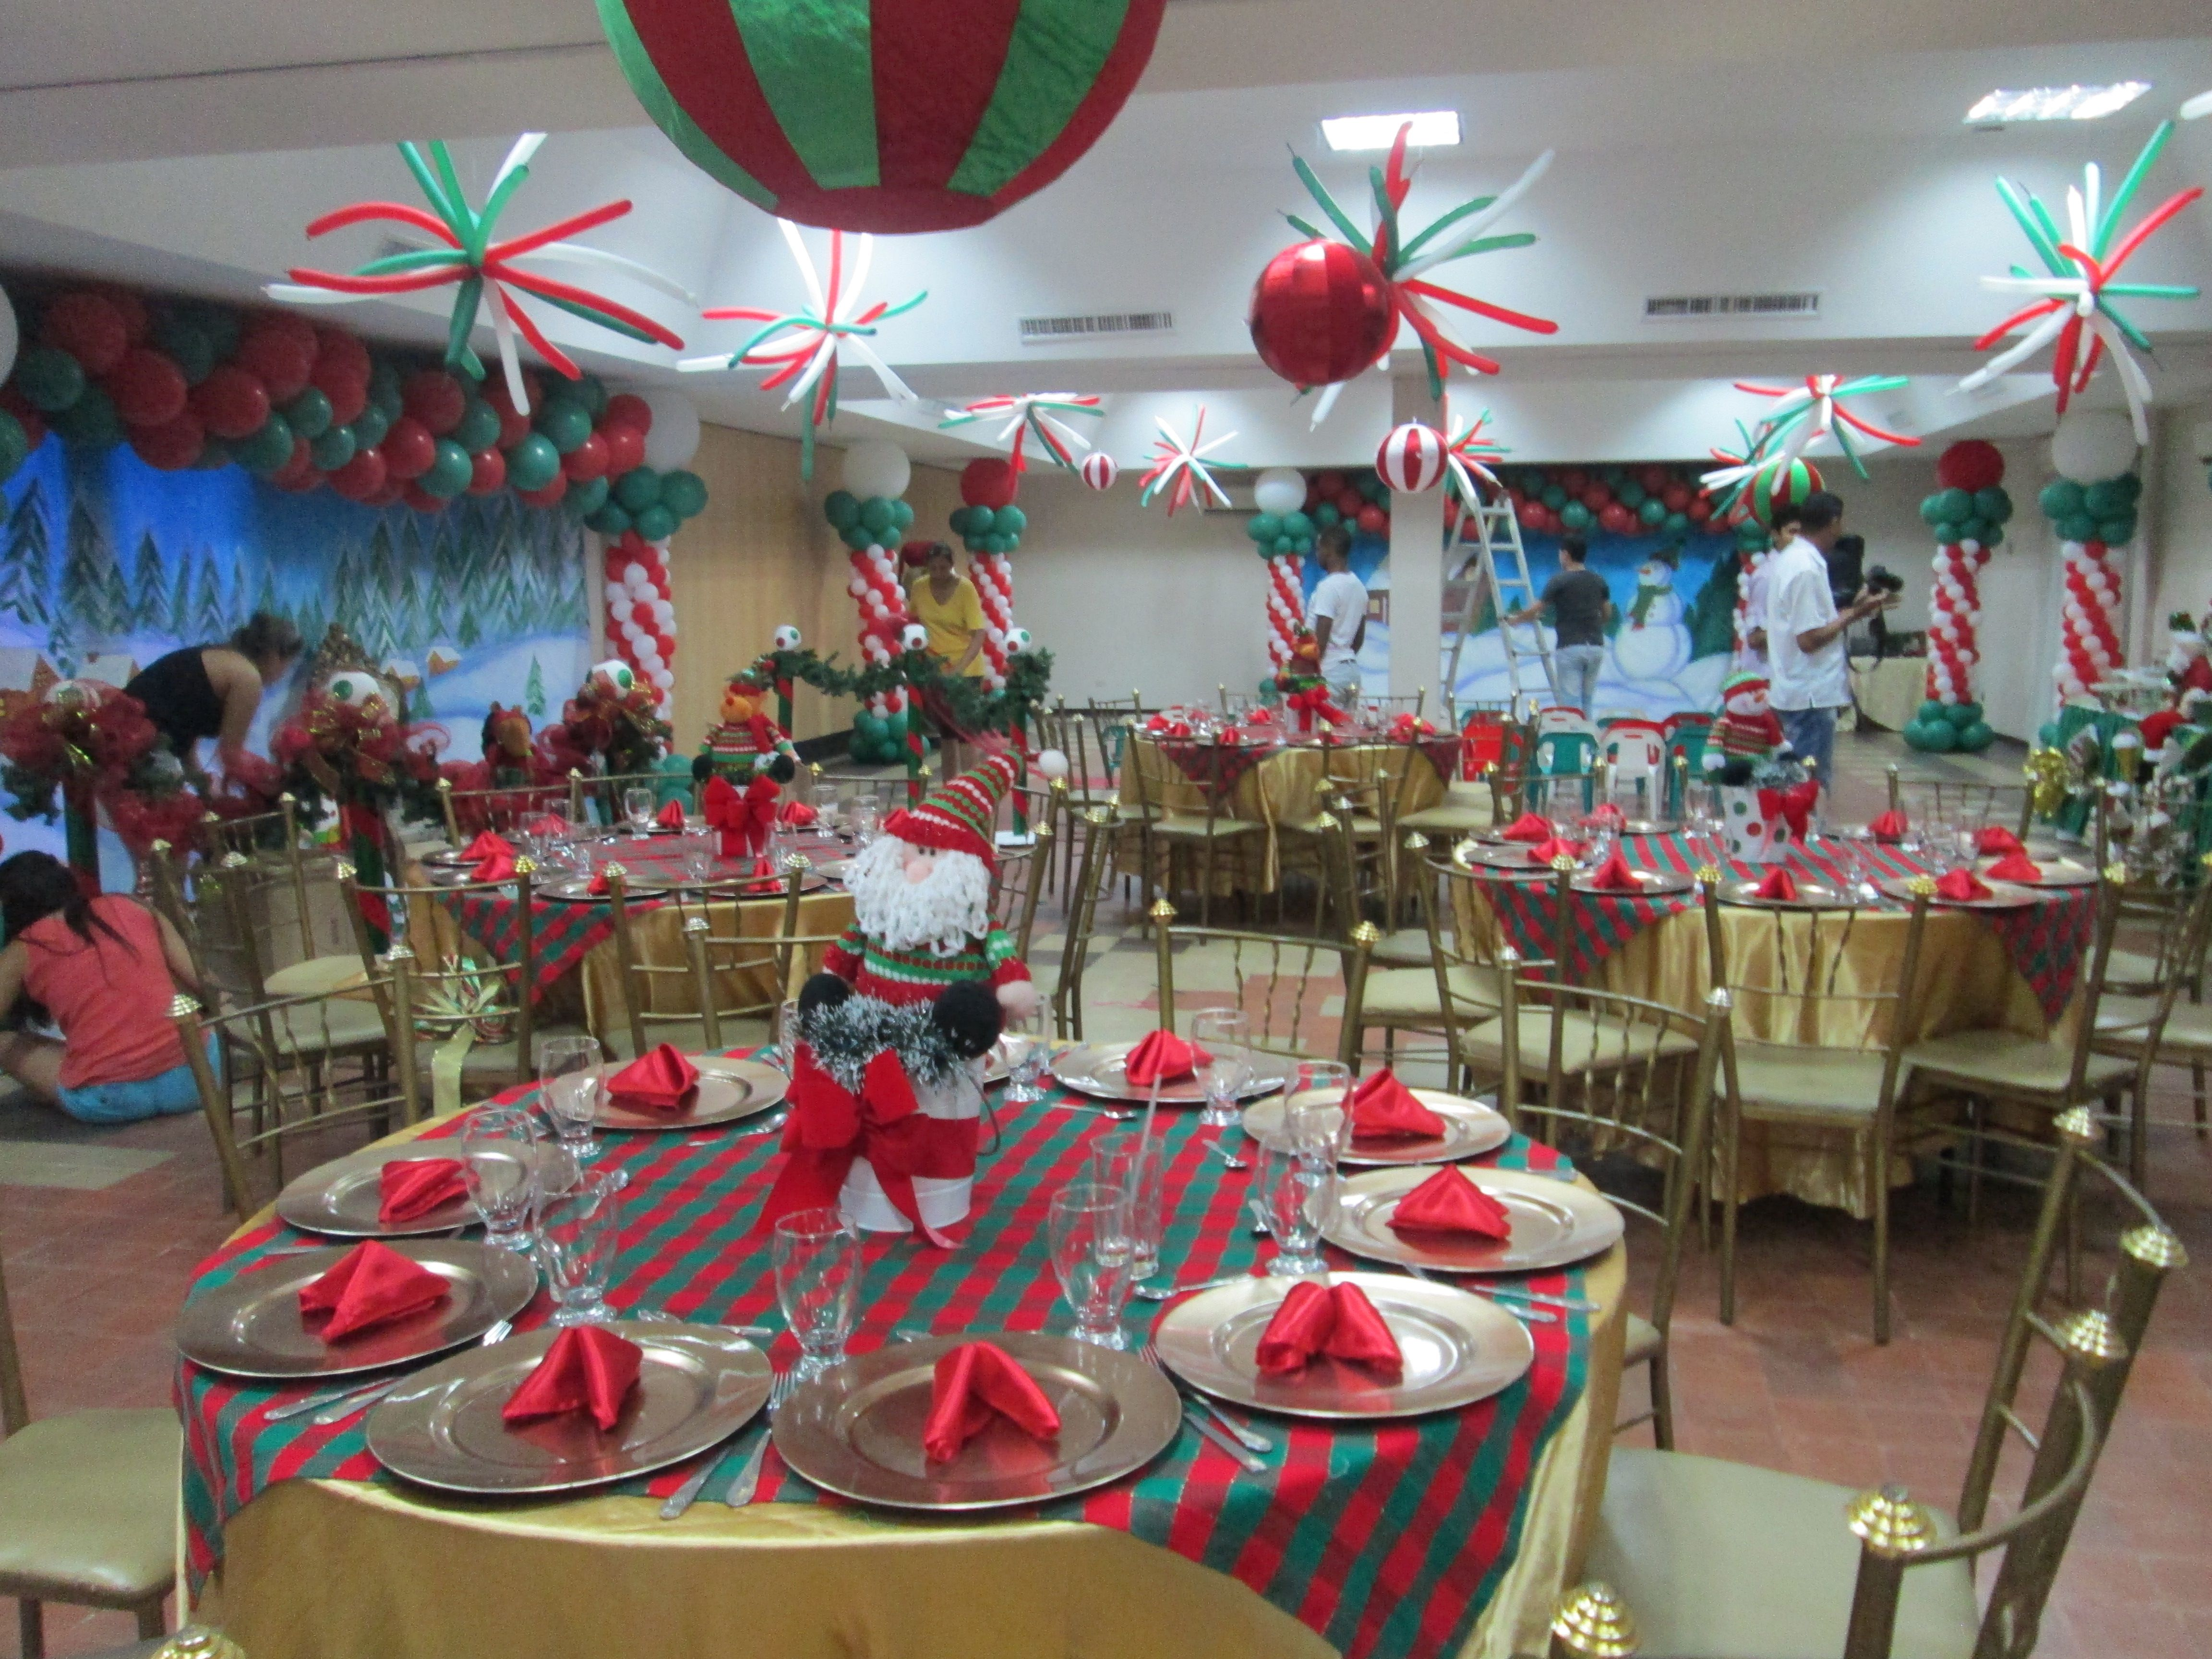 Cumplea os motivo navidad d decoracion de cumplea os 3 - Decoracion navidena artesanal ...